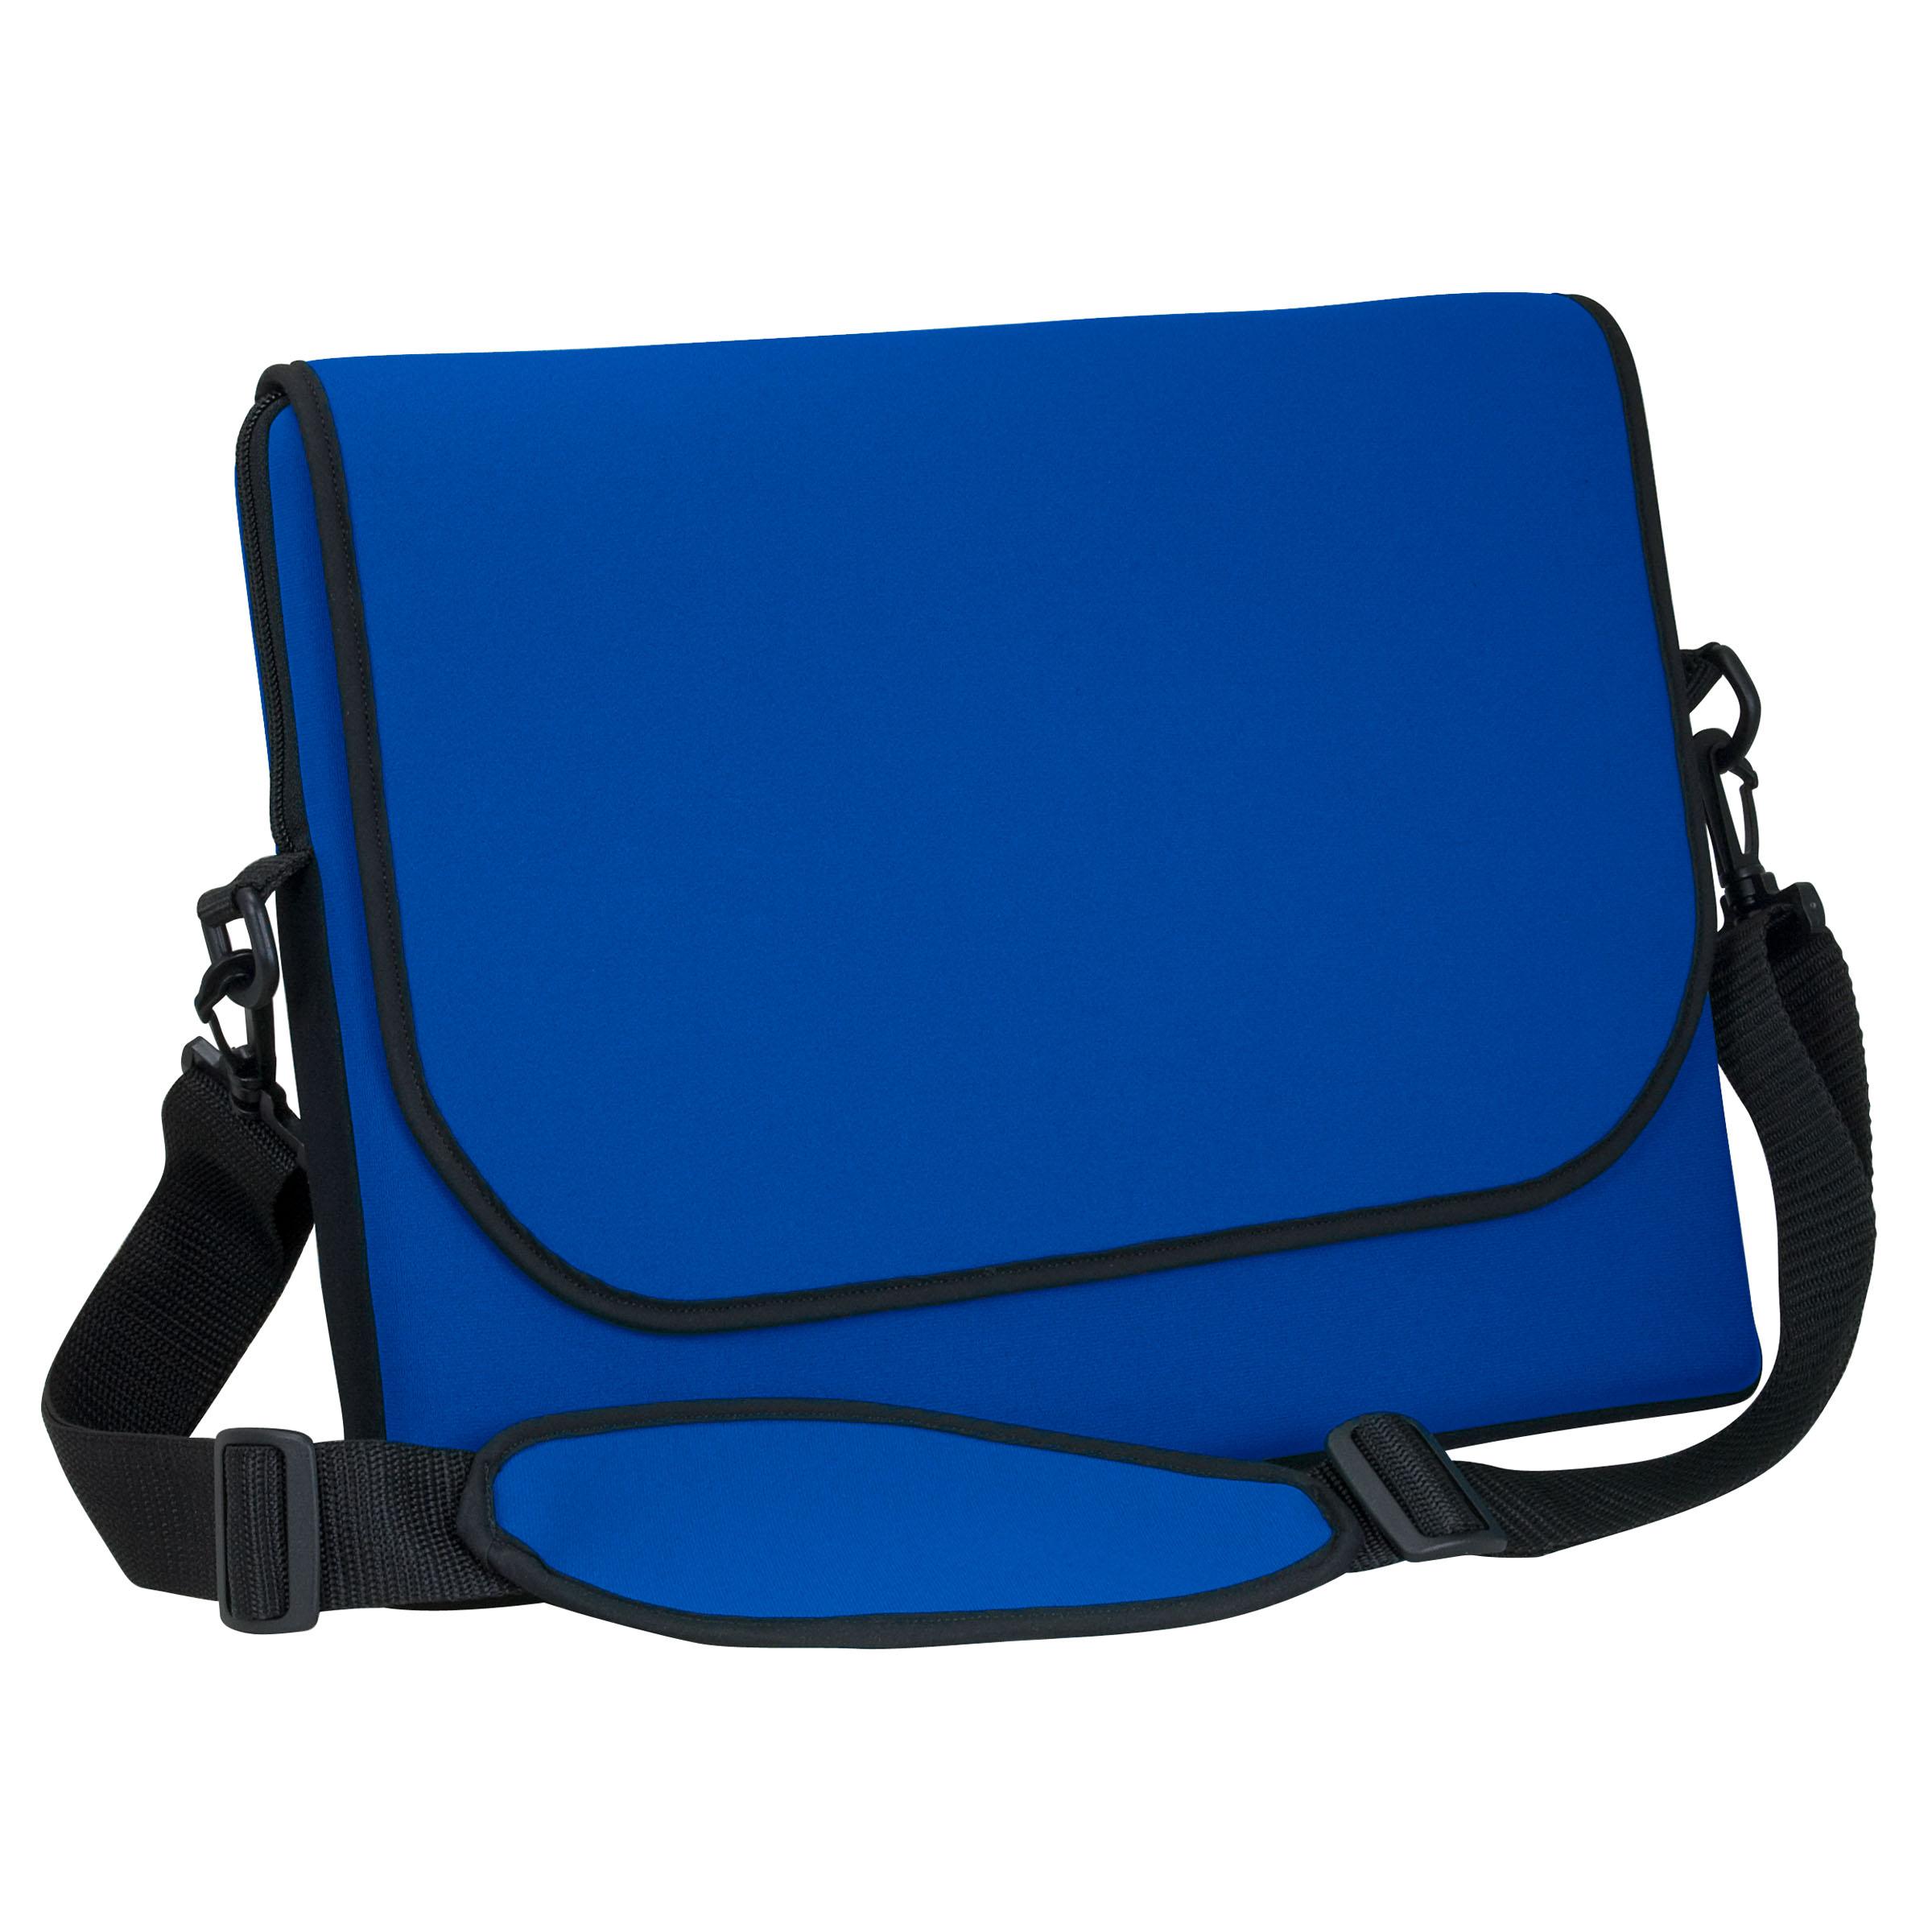 Numo Neoprene Messenger Bags Image Selector